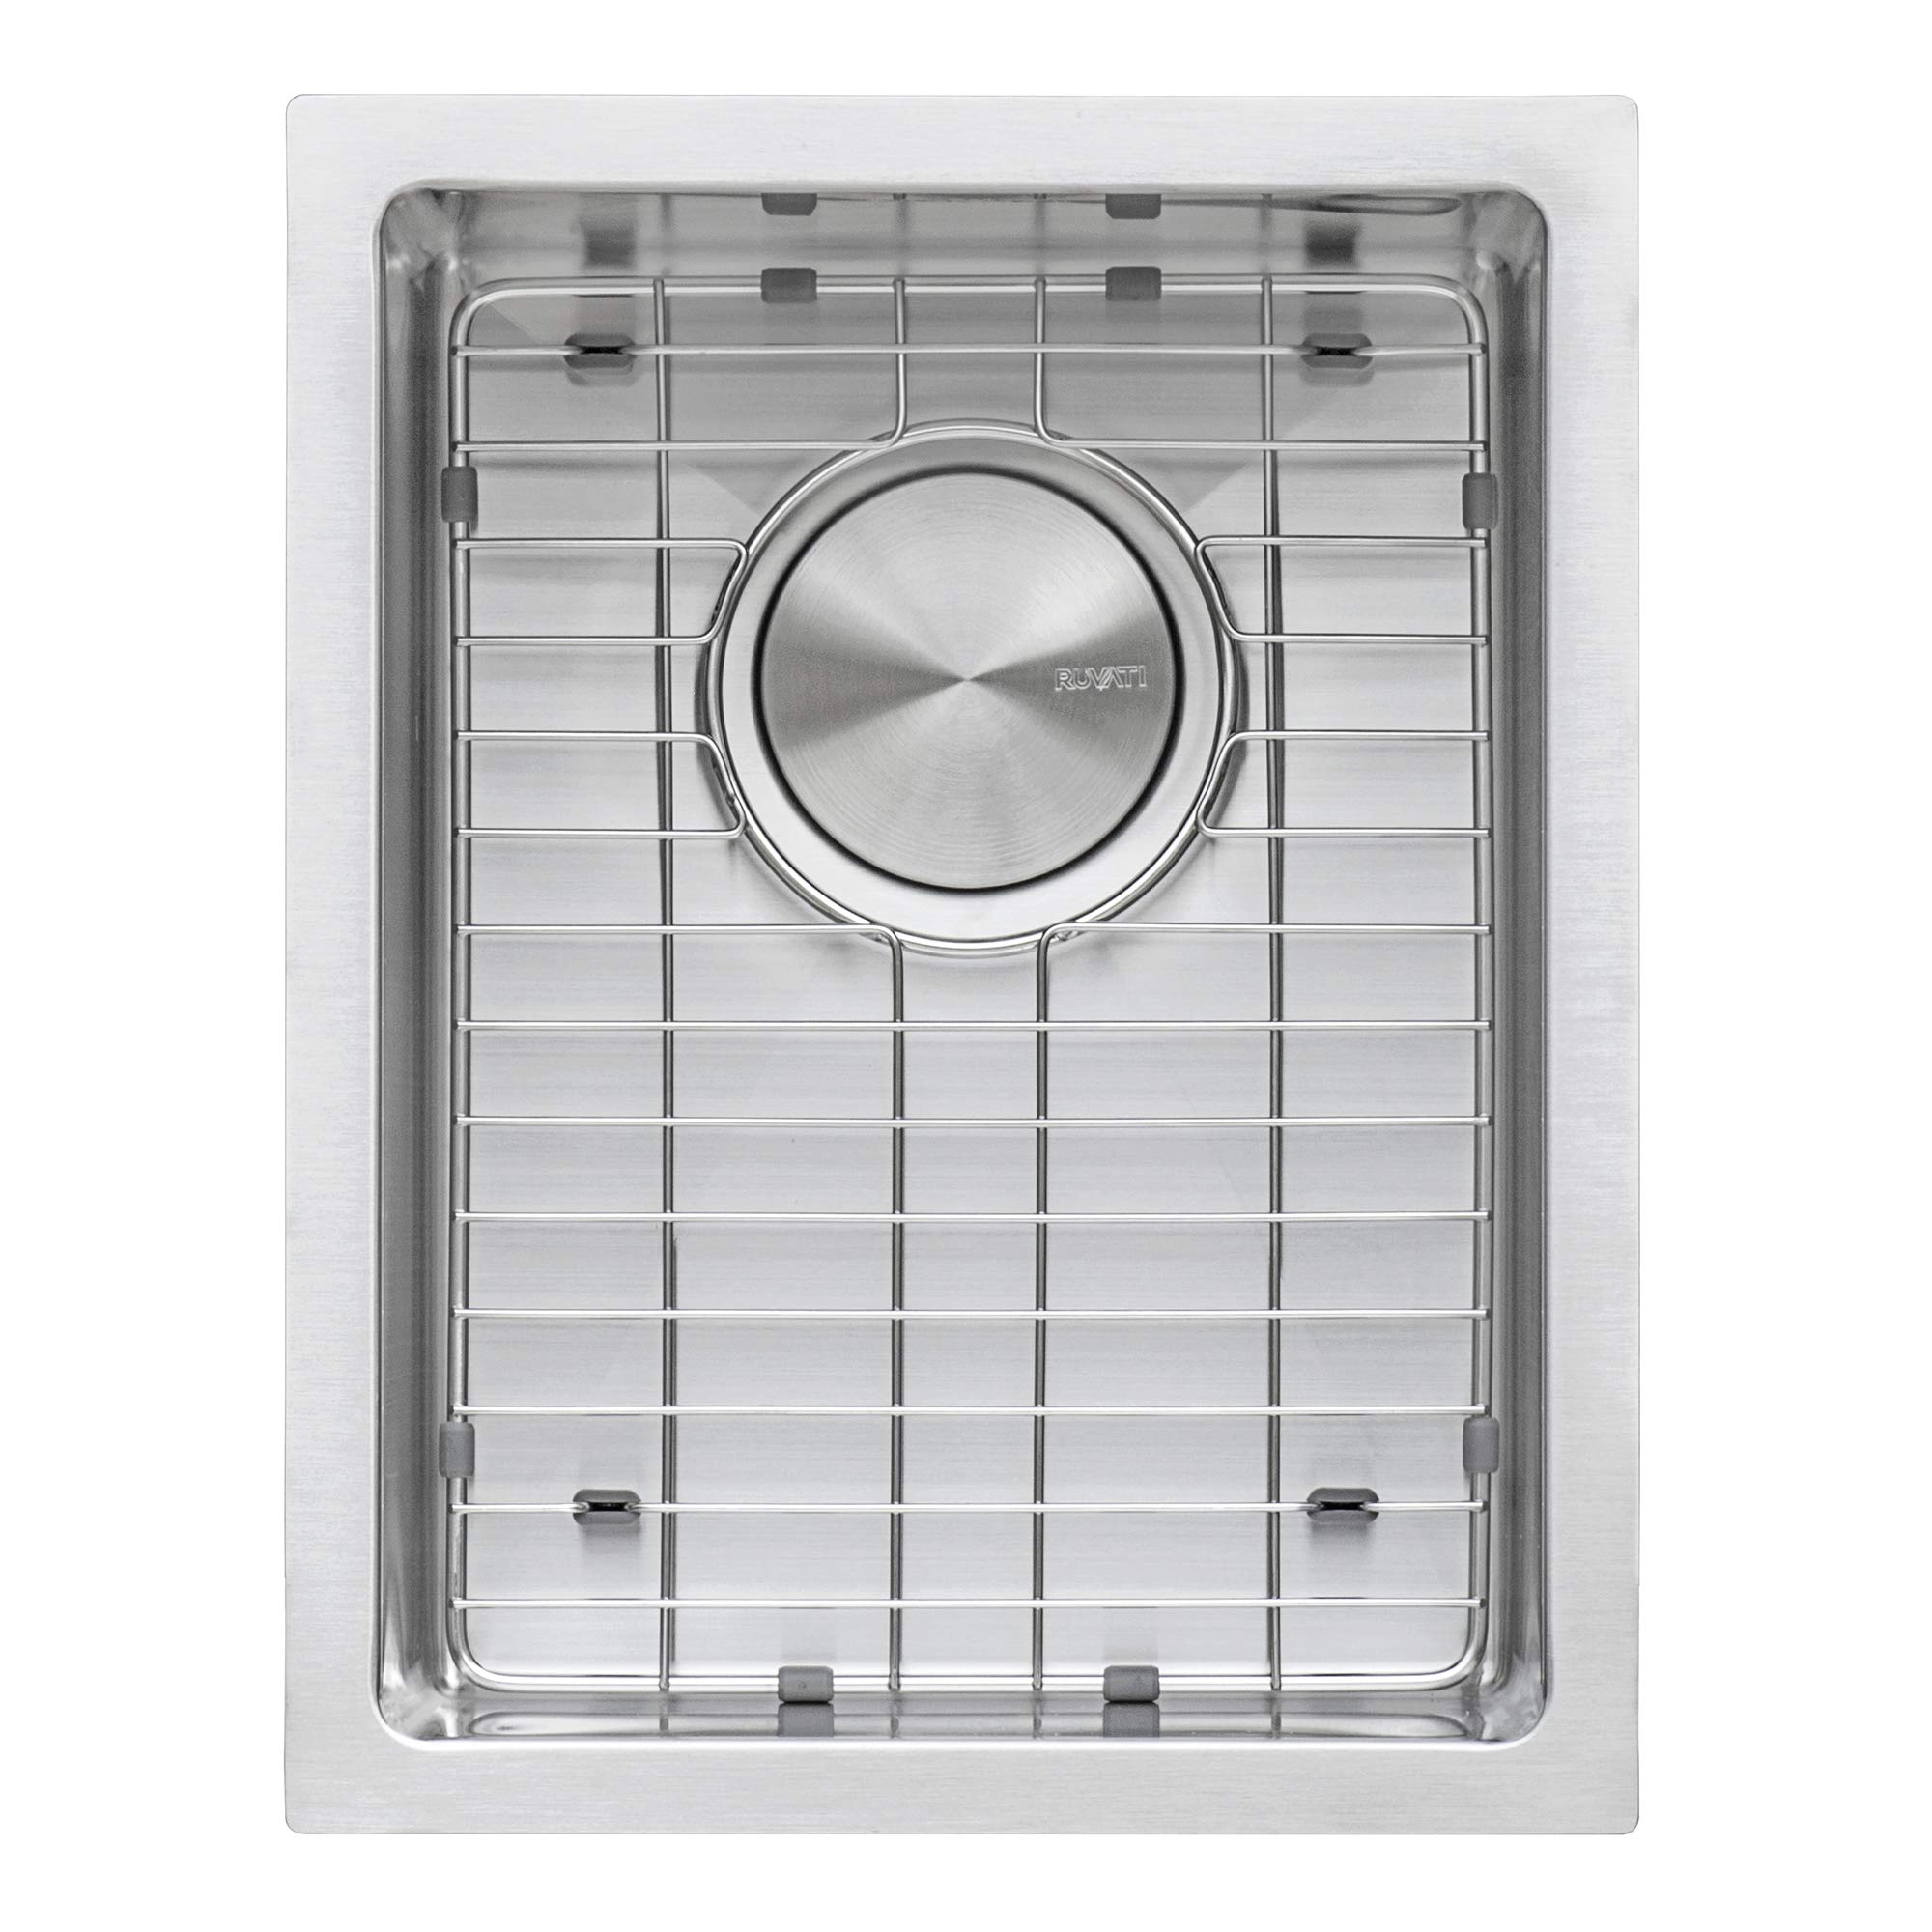 Ruvati 14-inch Undermount Wet Bar Prep Sink Tight Radius 16 Gauge Stainless Steel Single Bowl - RVH7114 by Ruvati (Image #3)